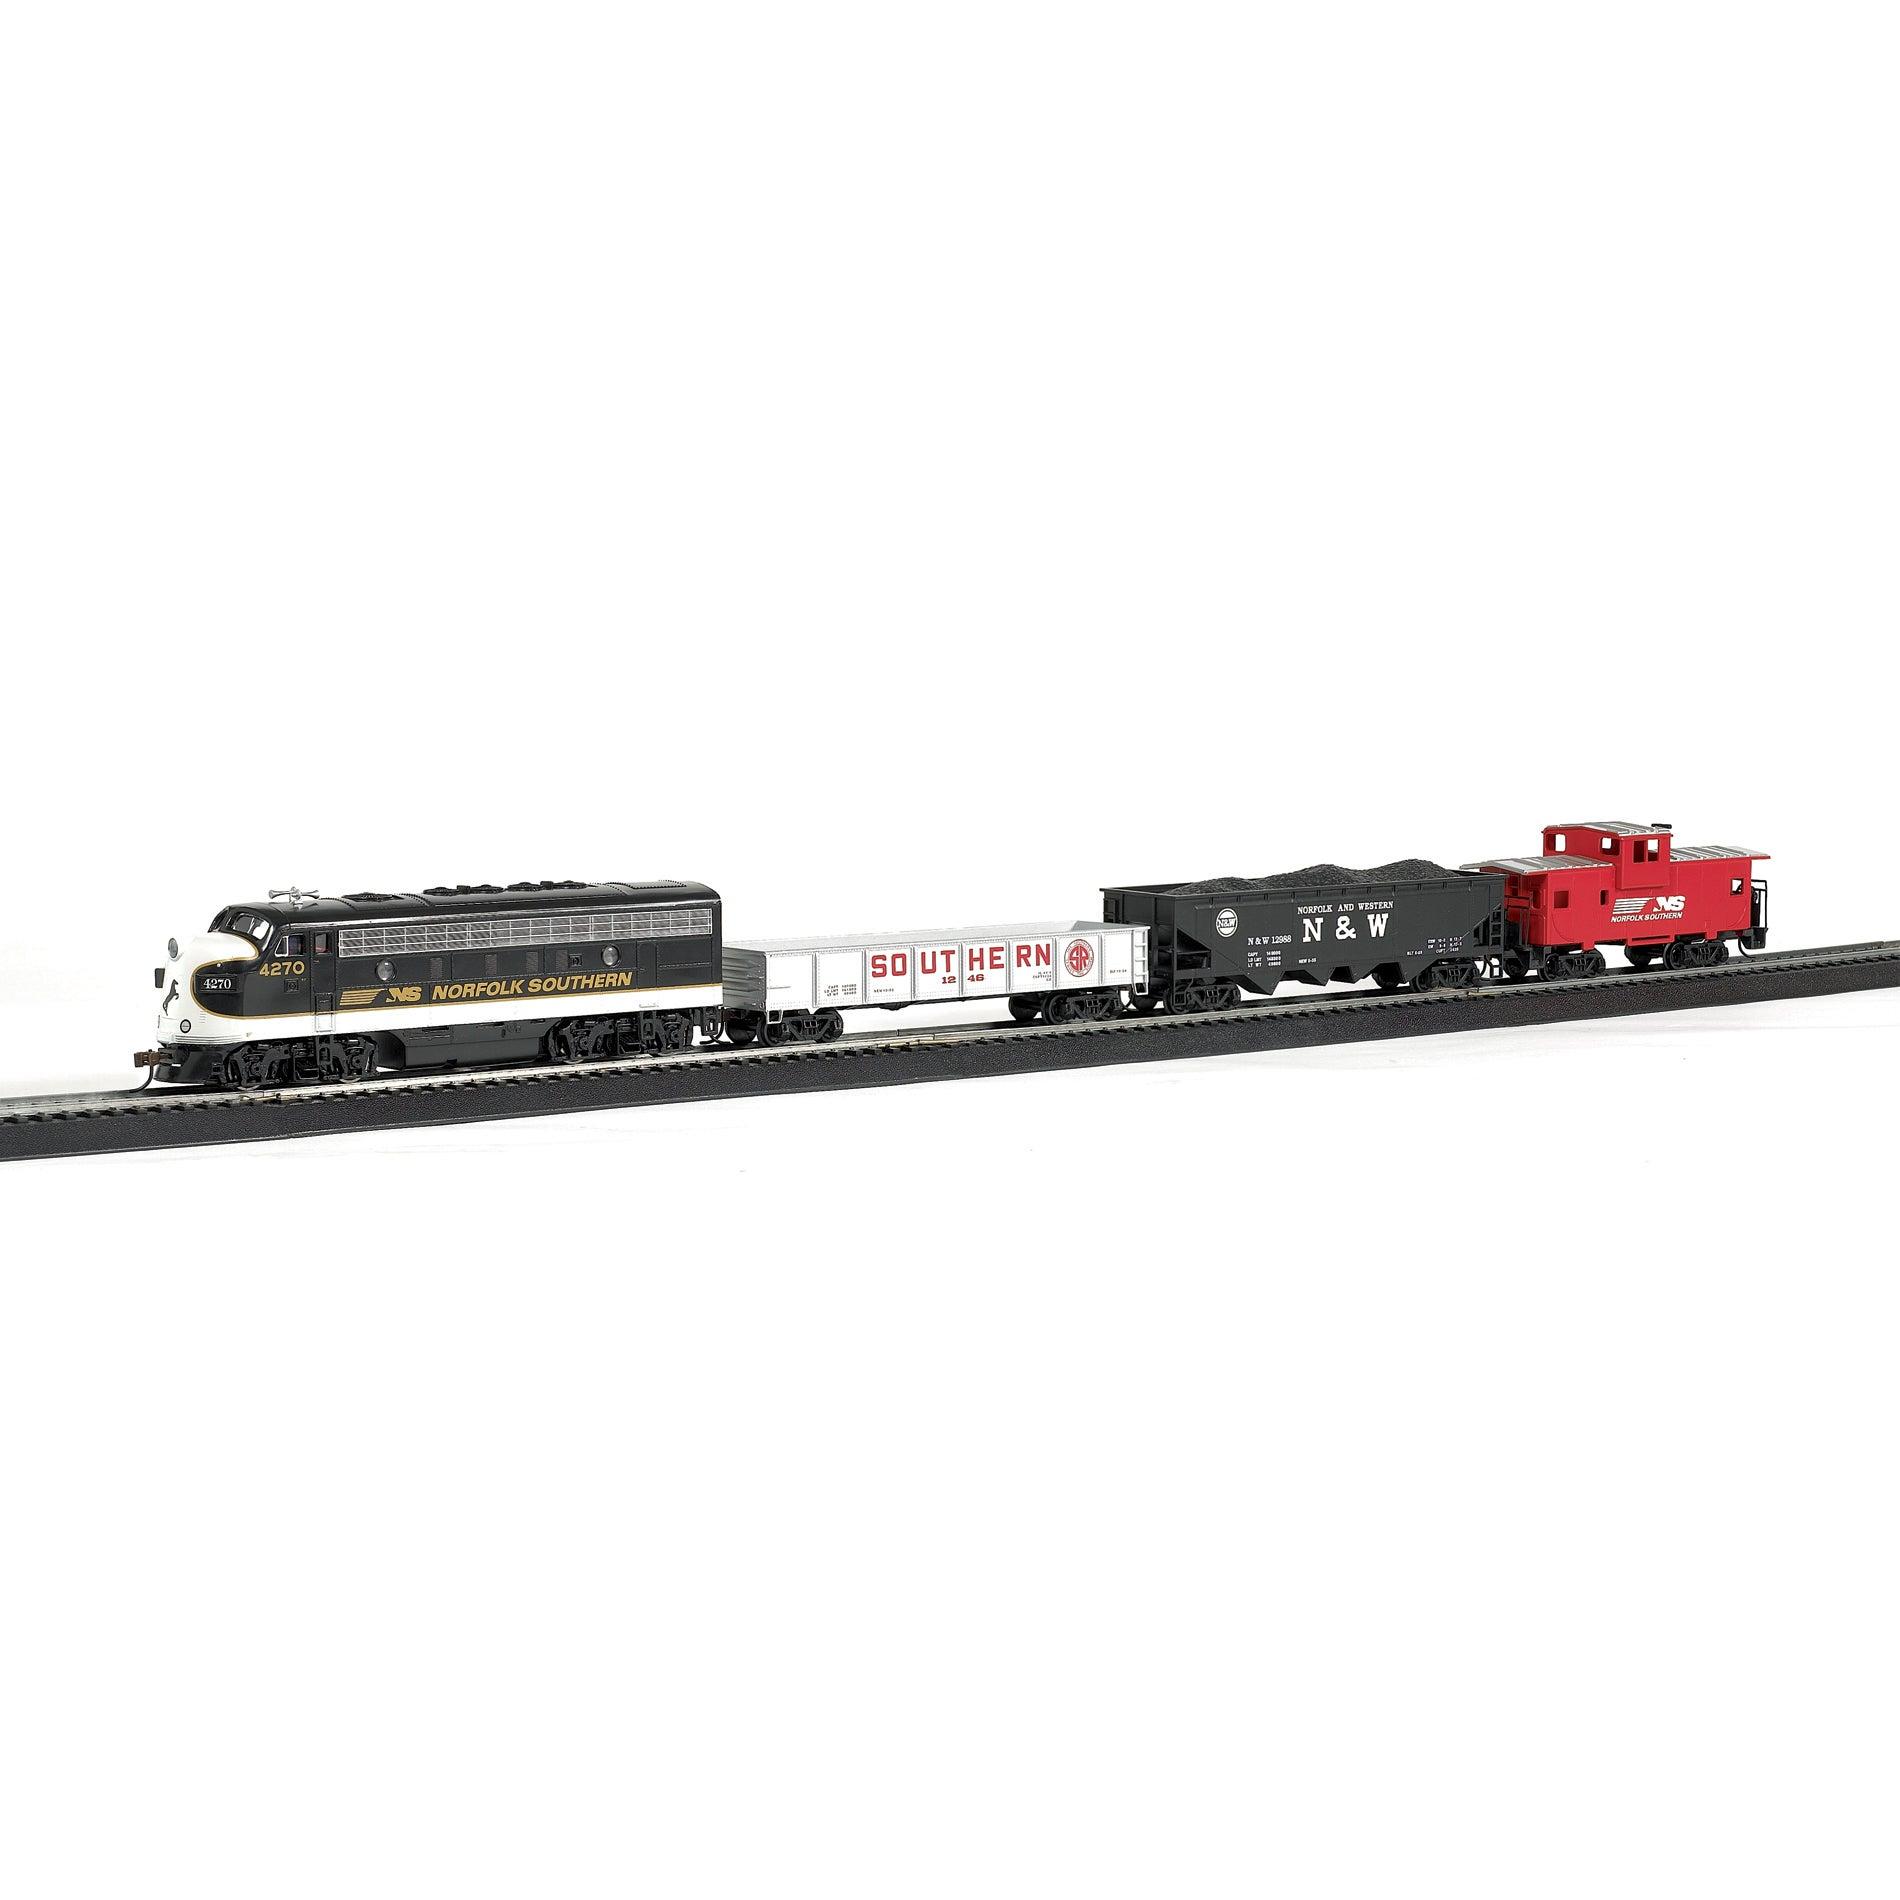 Bachmann ho scale thoroughbred train set 13922801 overstock com